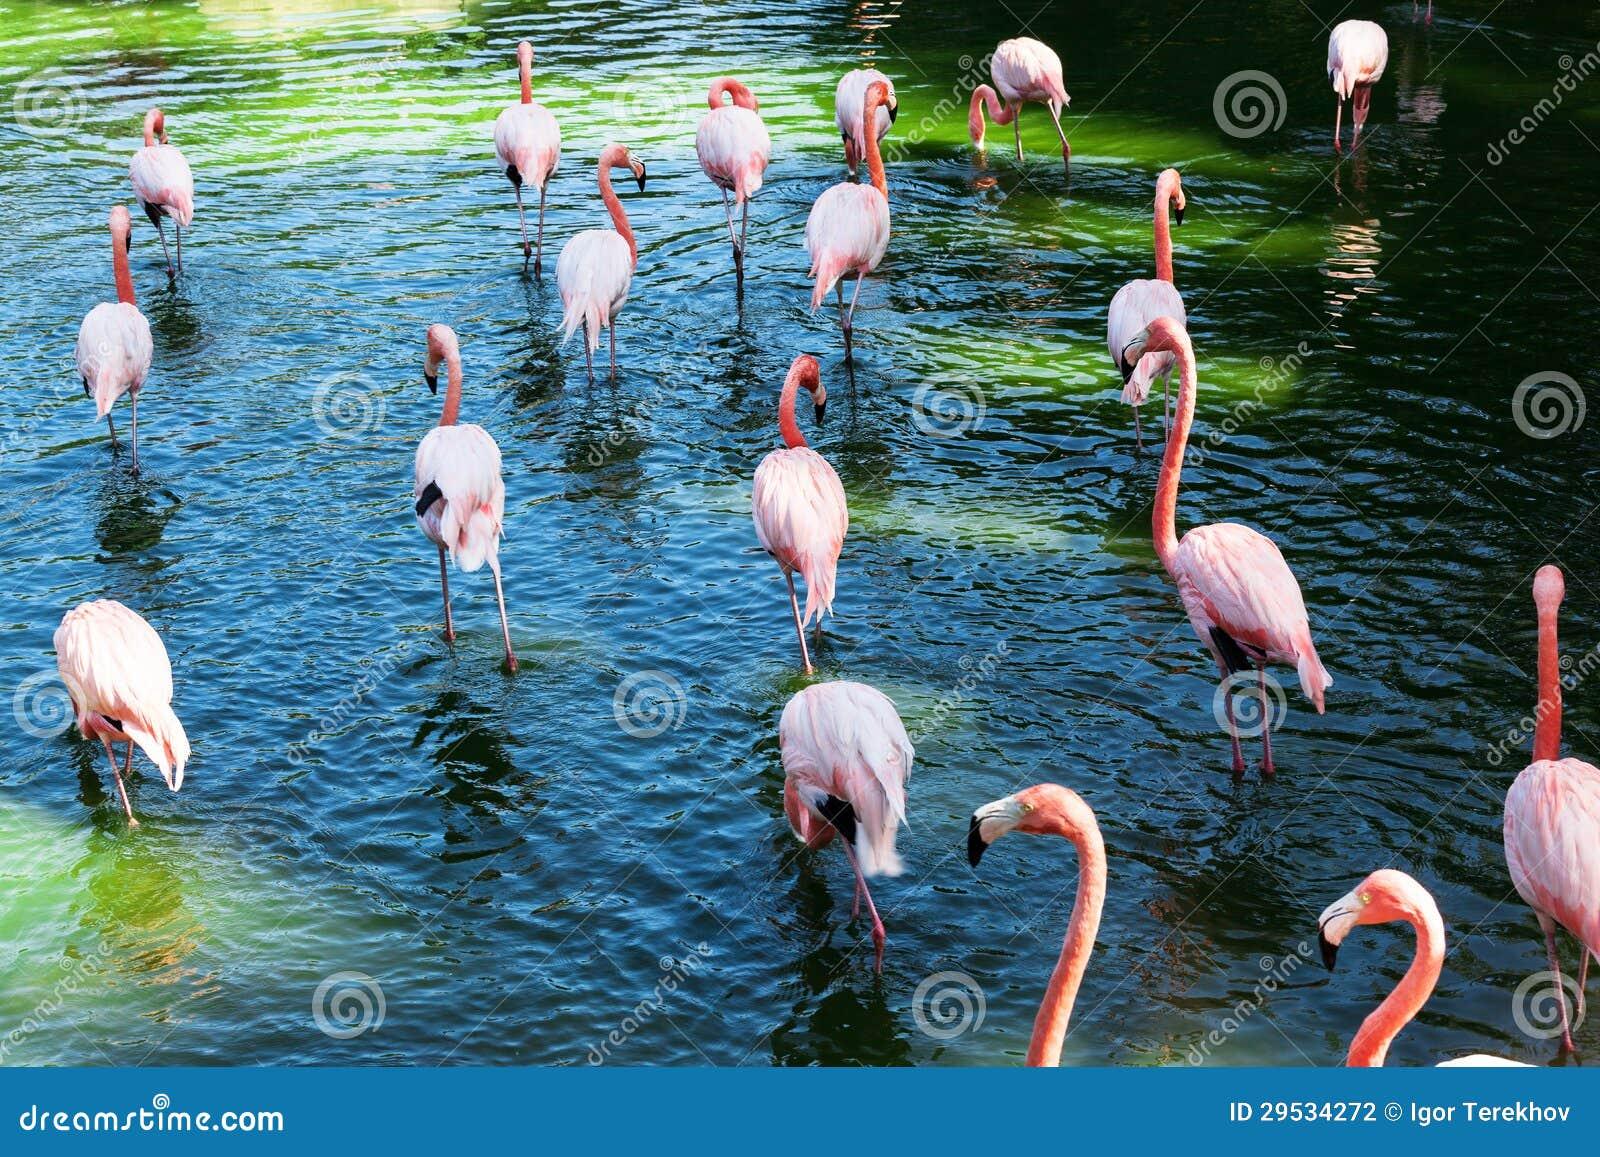 A Flock Of Flamingos S... Apartment Building Design In 3d